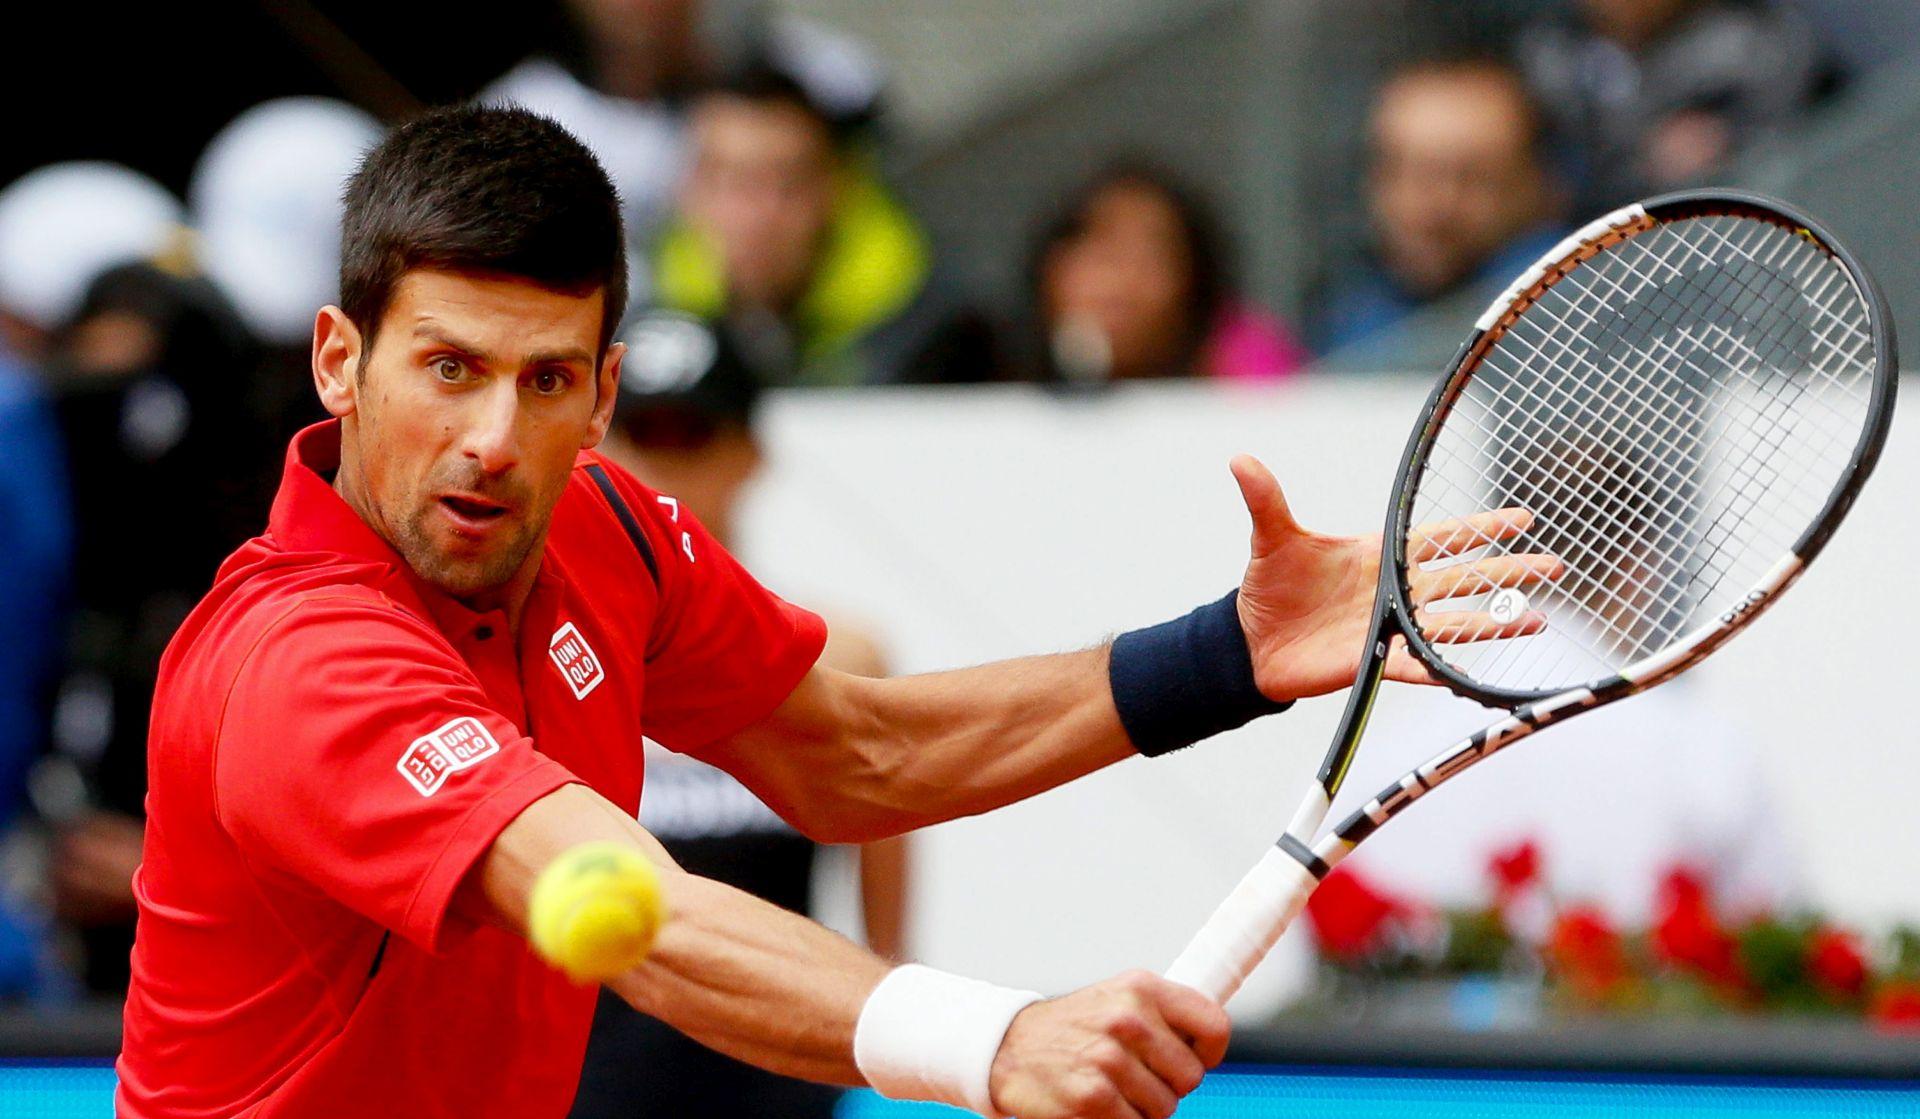 ATP MADRID Đoković preko Murrayja do 29. turnira Masters 1000